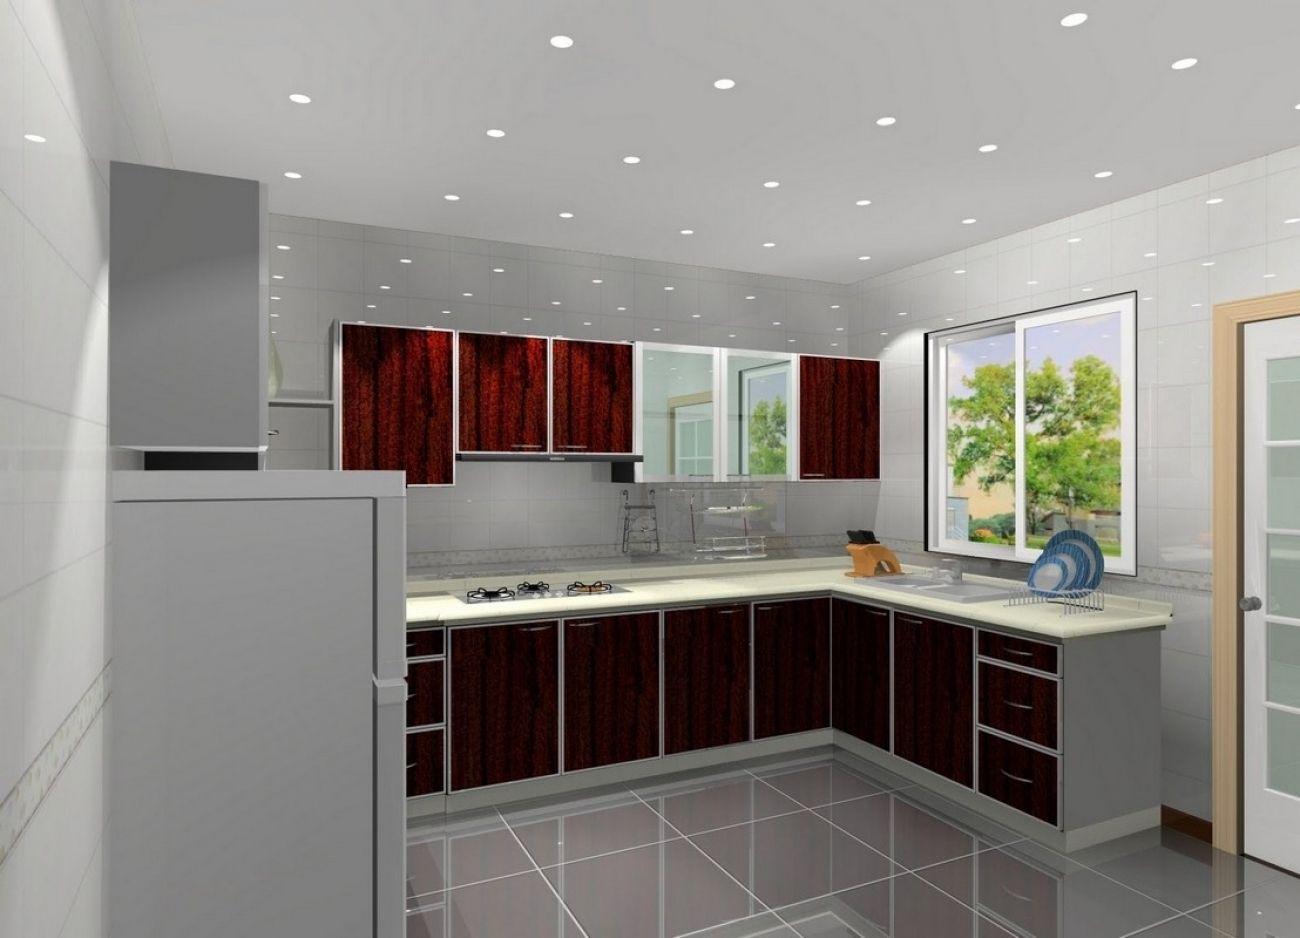 Best 25+ Gray kitchen paint ideas on Pinterest | Painting cabinets ...